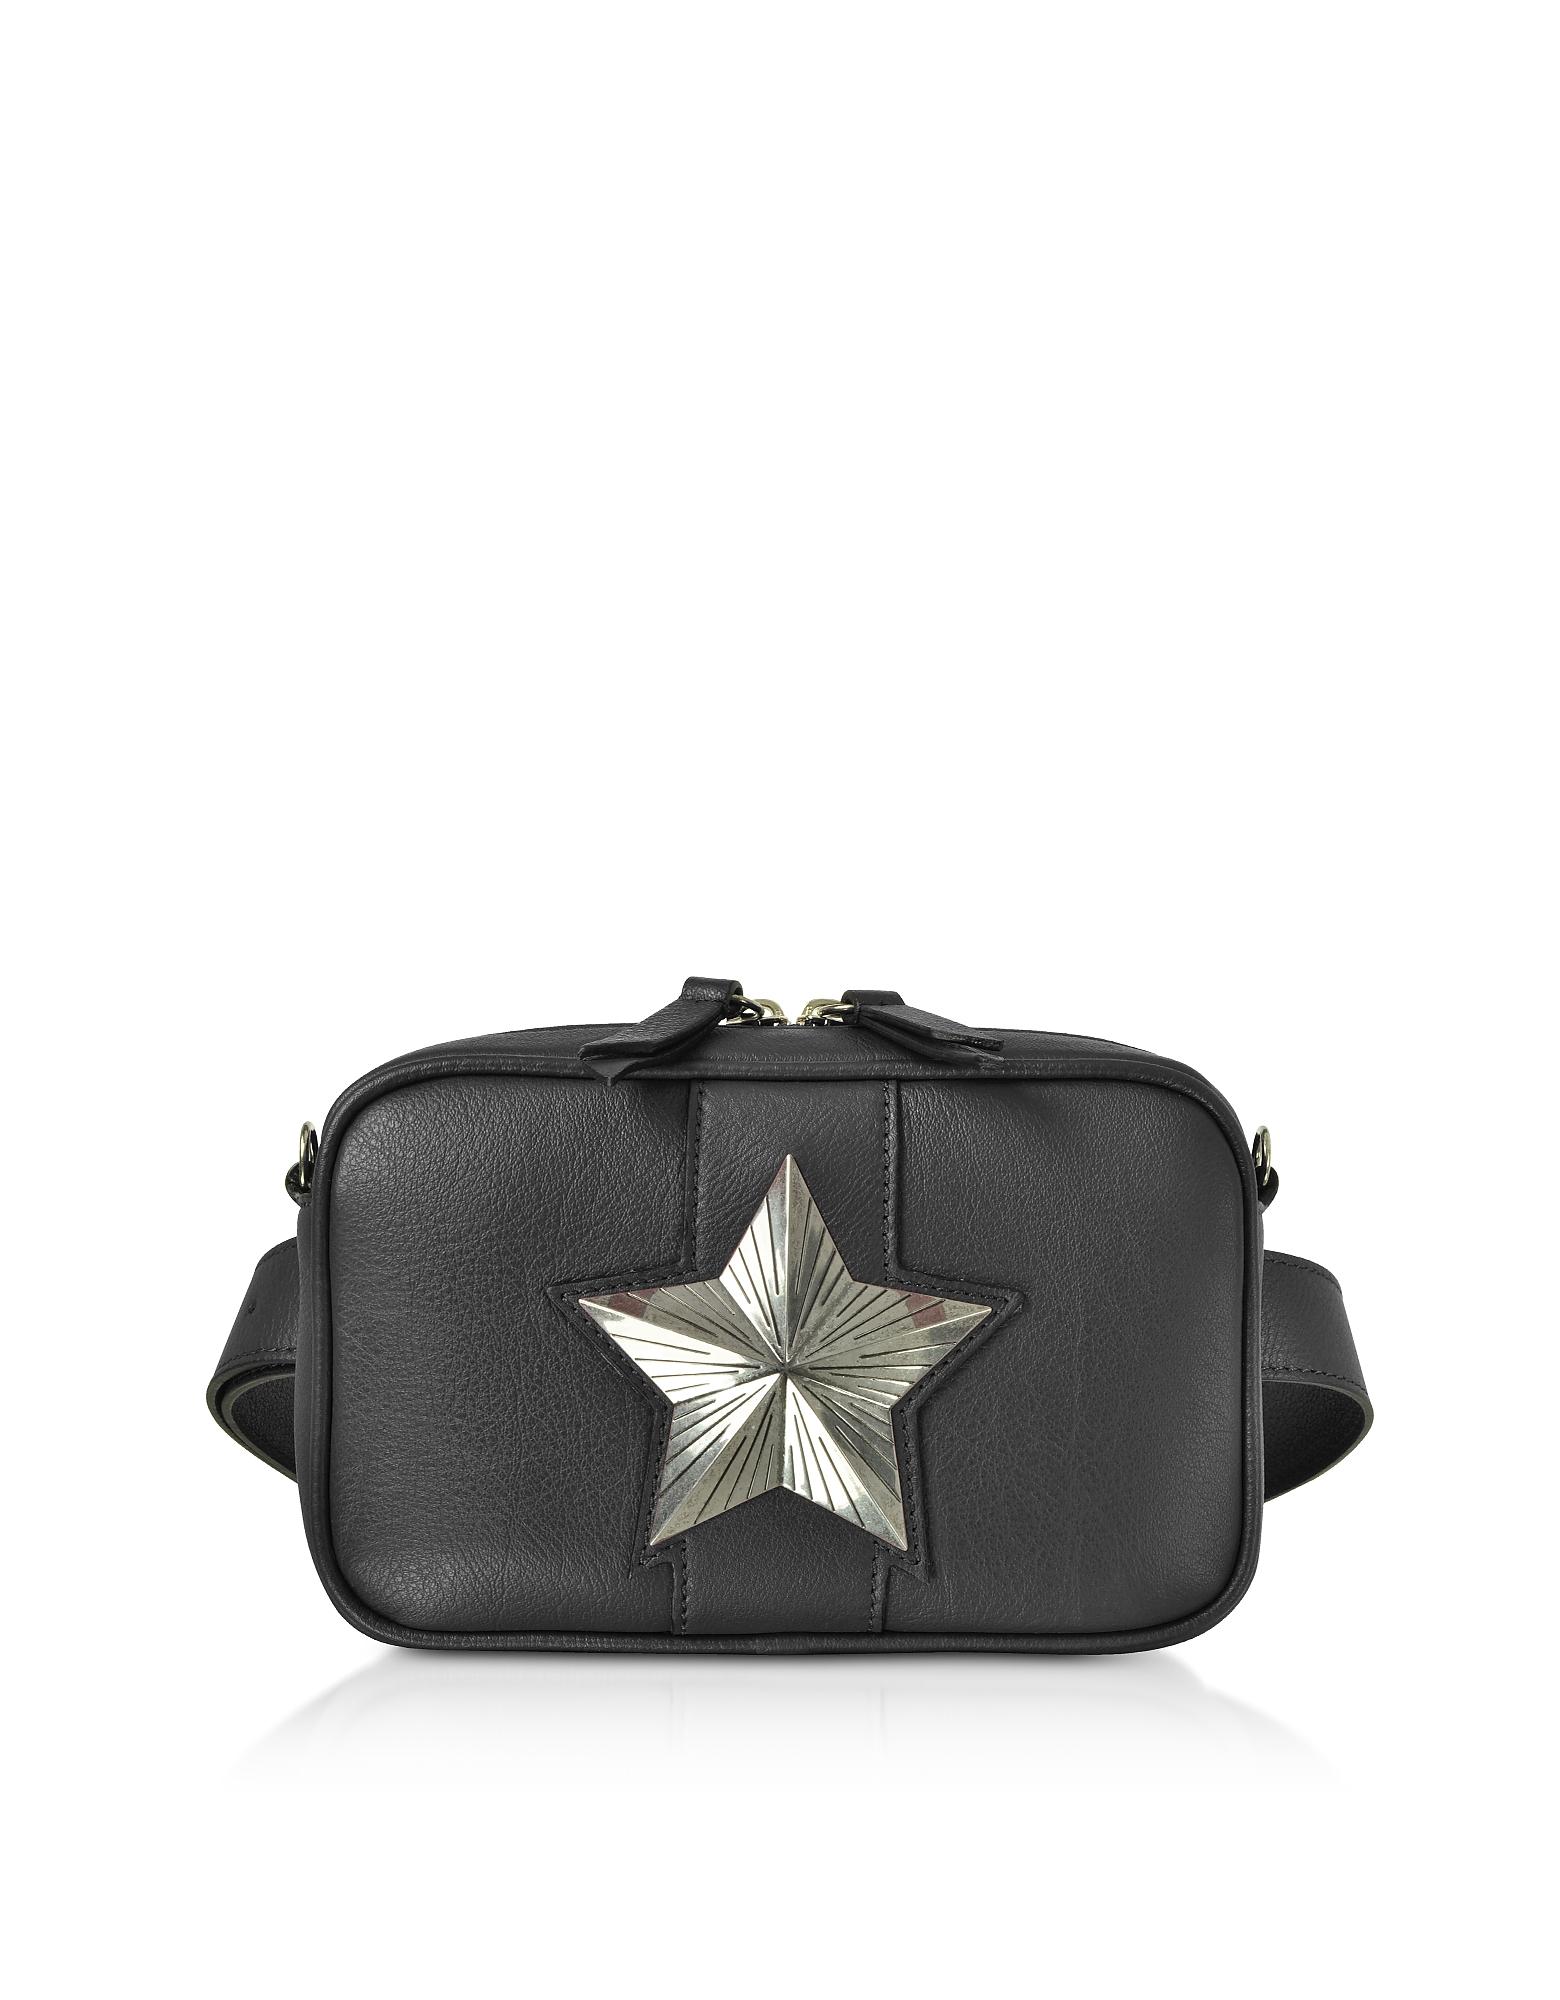 Les Jeunes Etoiles Handbags, Leather Vega Belt Bag w/Chain Strap